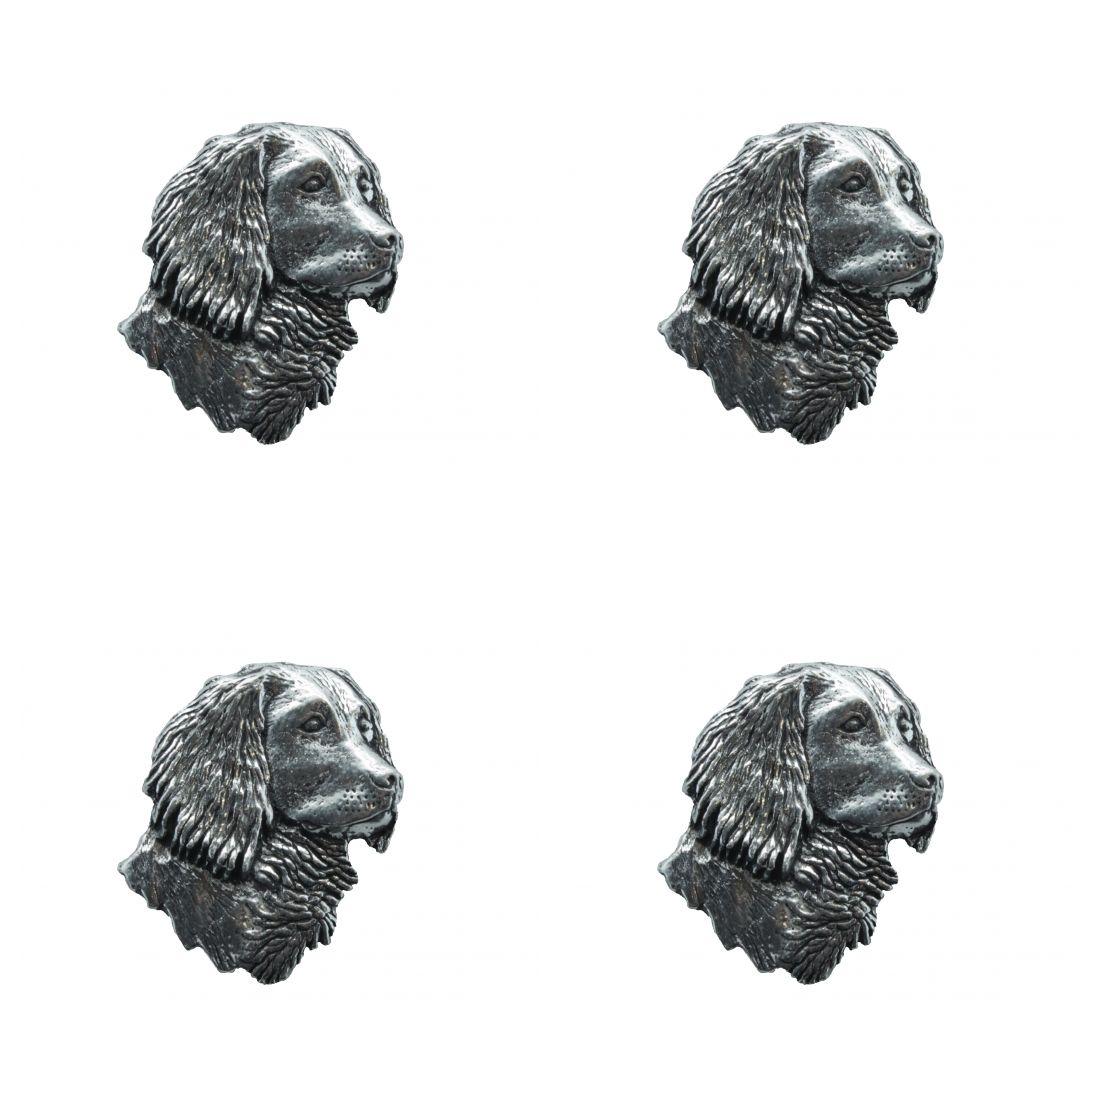 4x Pin Anstecker Badge Kopf Cockerspaniel, 2,4x3cm